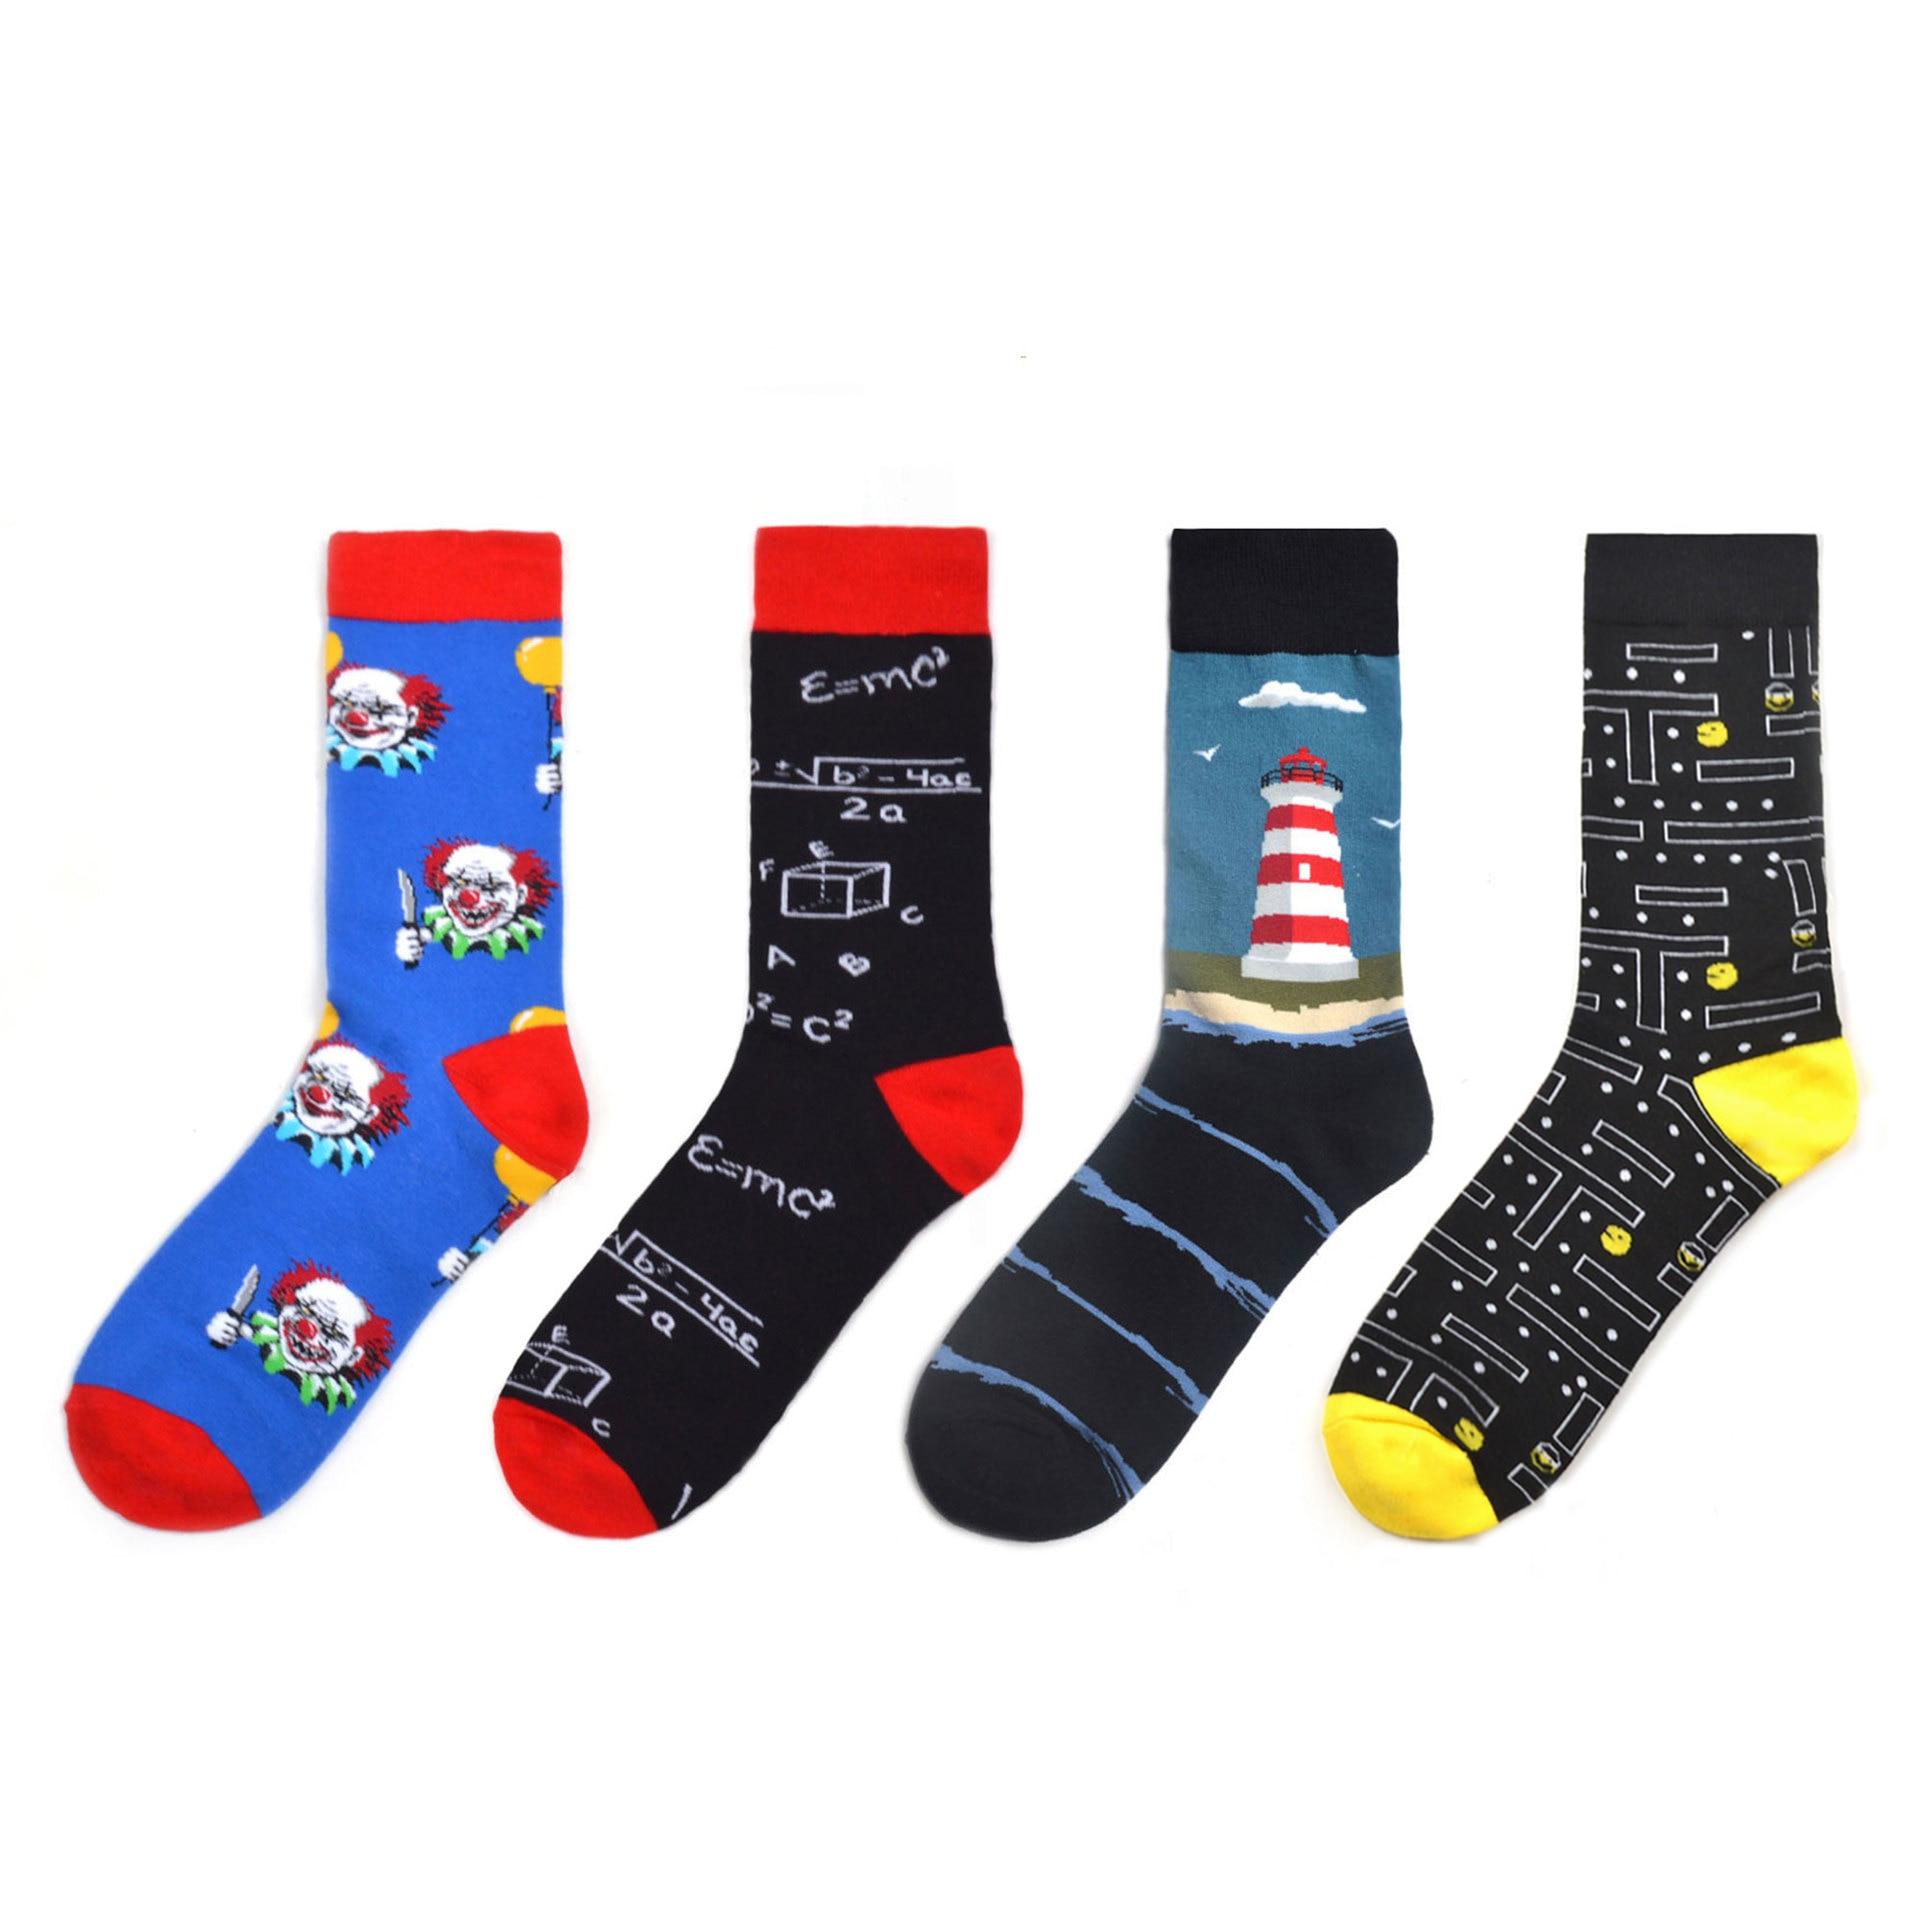 Cool Creative Funny Hip Hop Men's Cotton Crew Socks Funny Colorful Fashion Skateboard Socks Novelty Street Wear For Wedding Gift